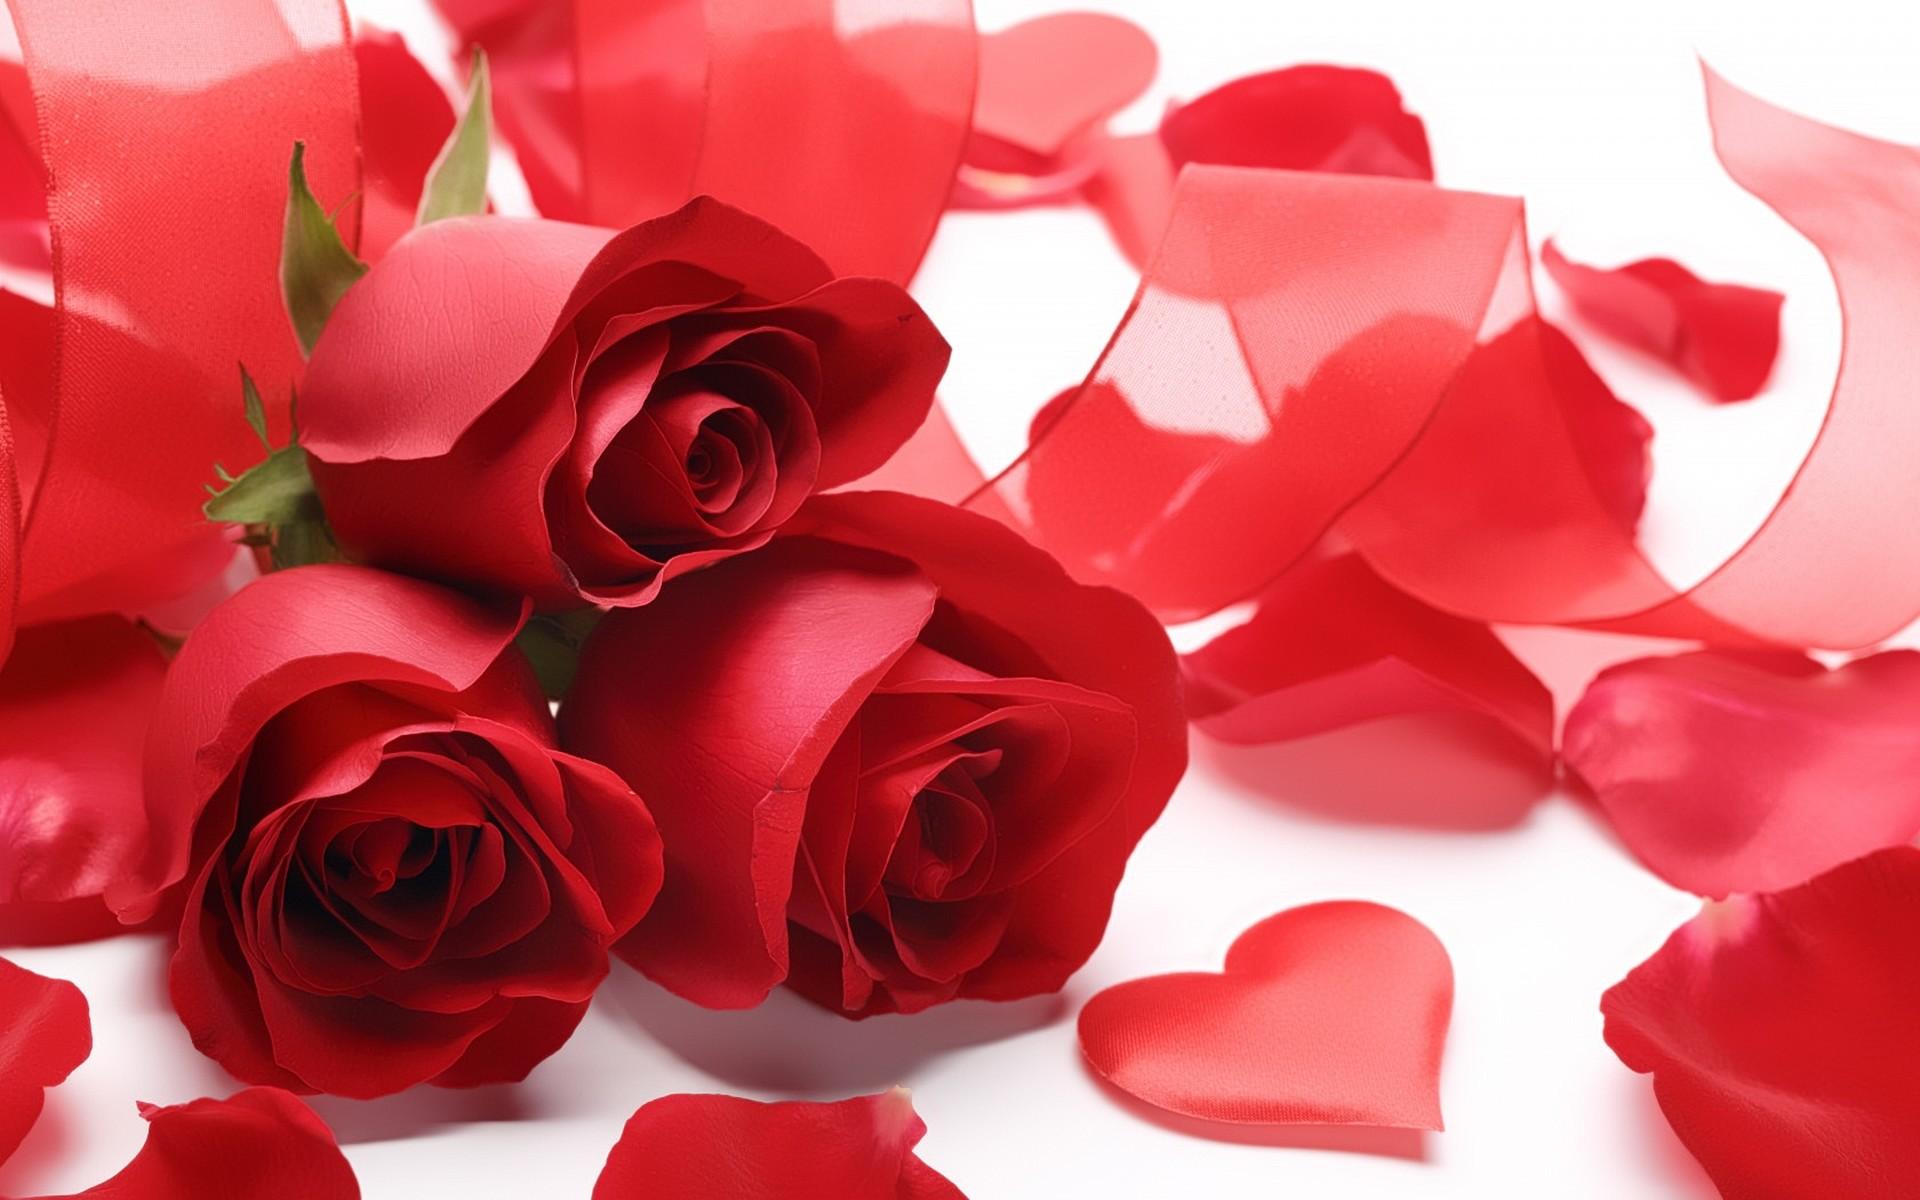 Red Rose Love Wallpaper (55+ images)